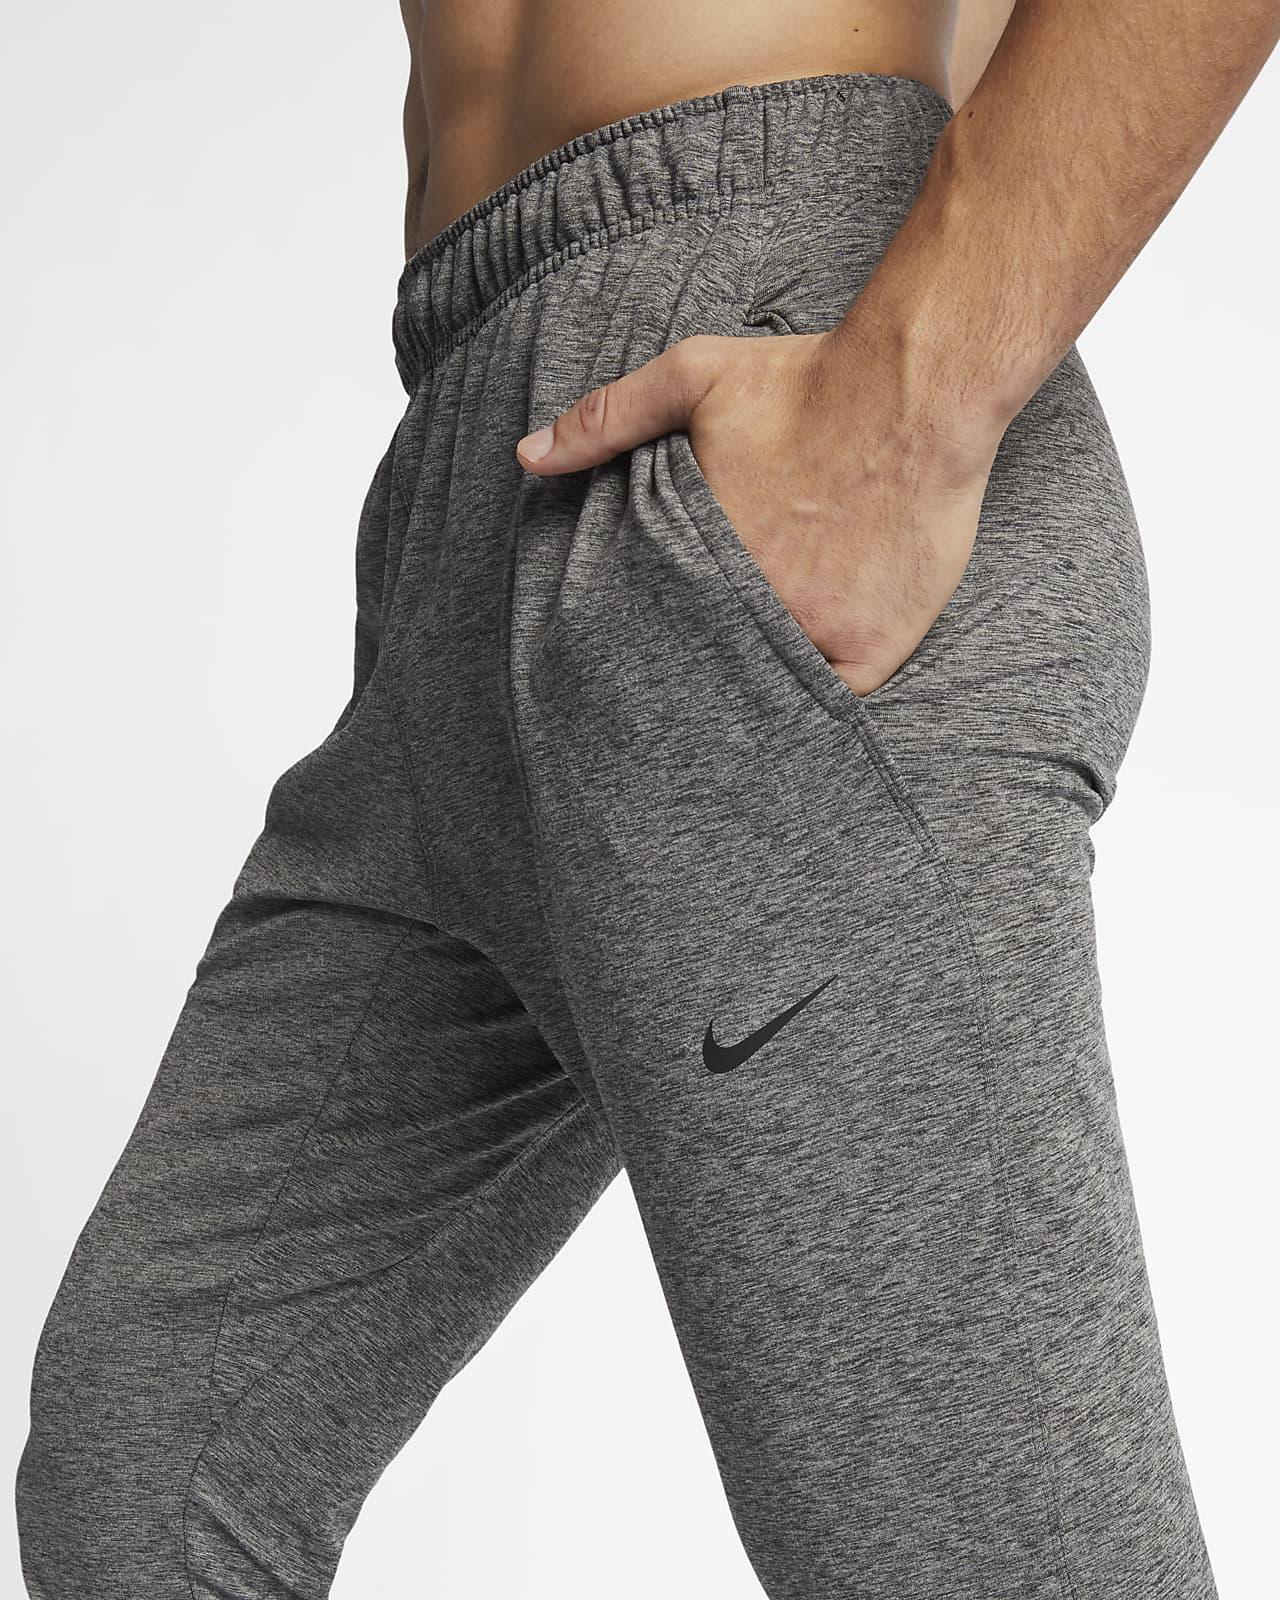 Men in yoga pants nz Nike Dri Fit Men S Yoga Trousers Nike Nz